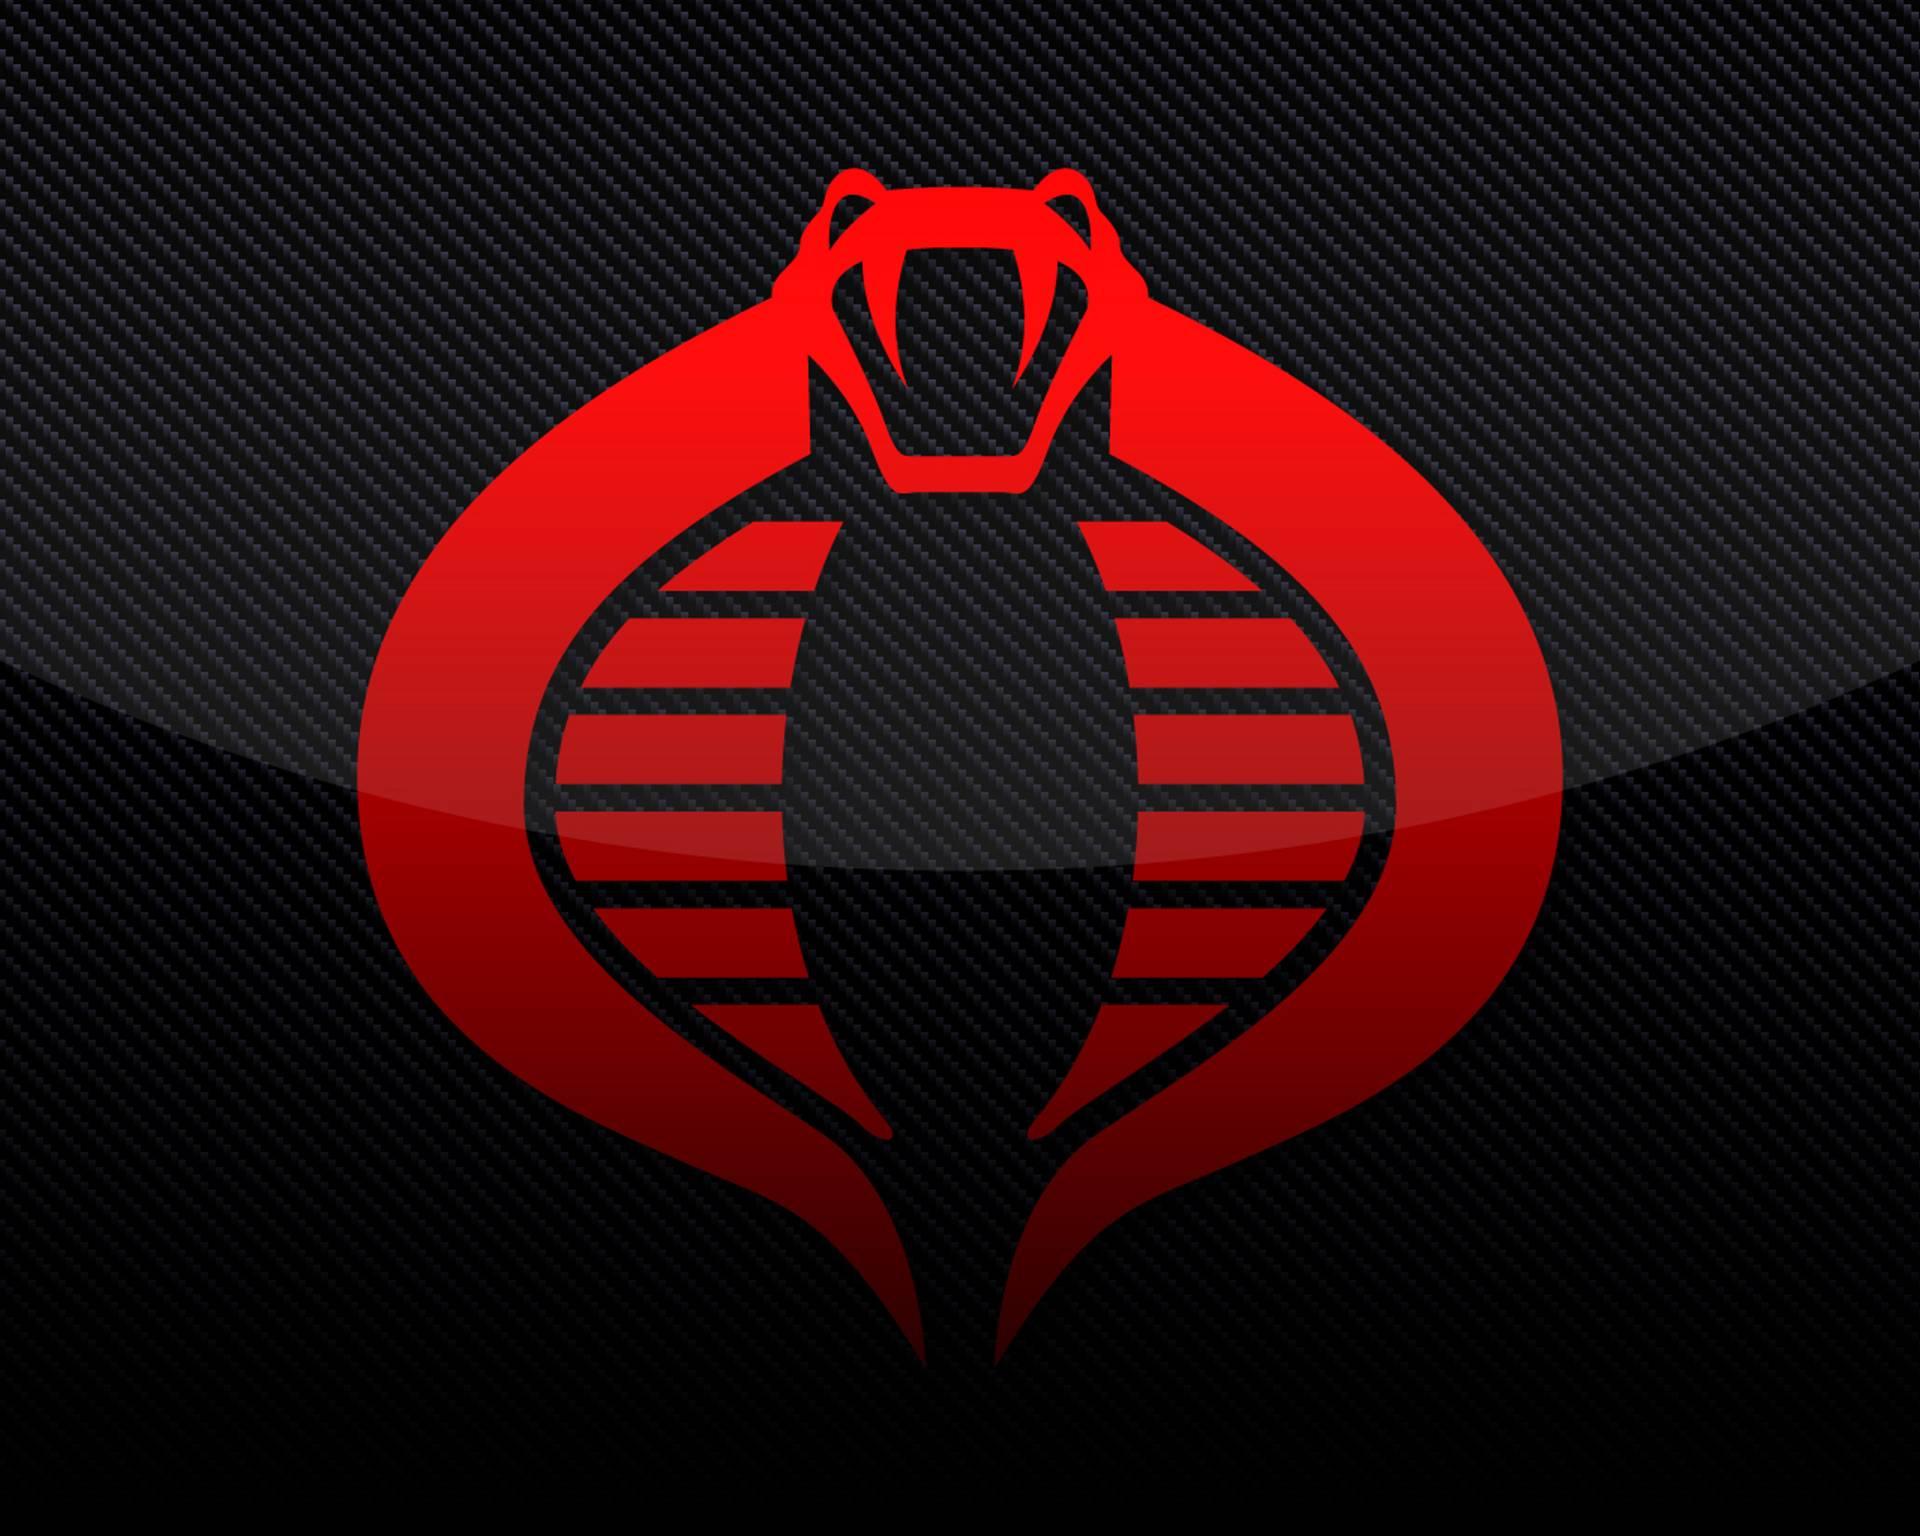 Best 56 Cobra Commander Wallpaper on HipWallpaper Commander 1920x1536